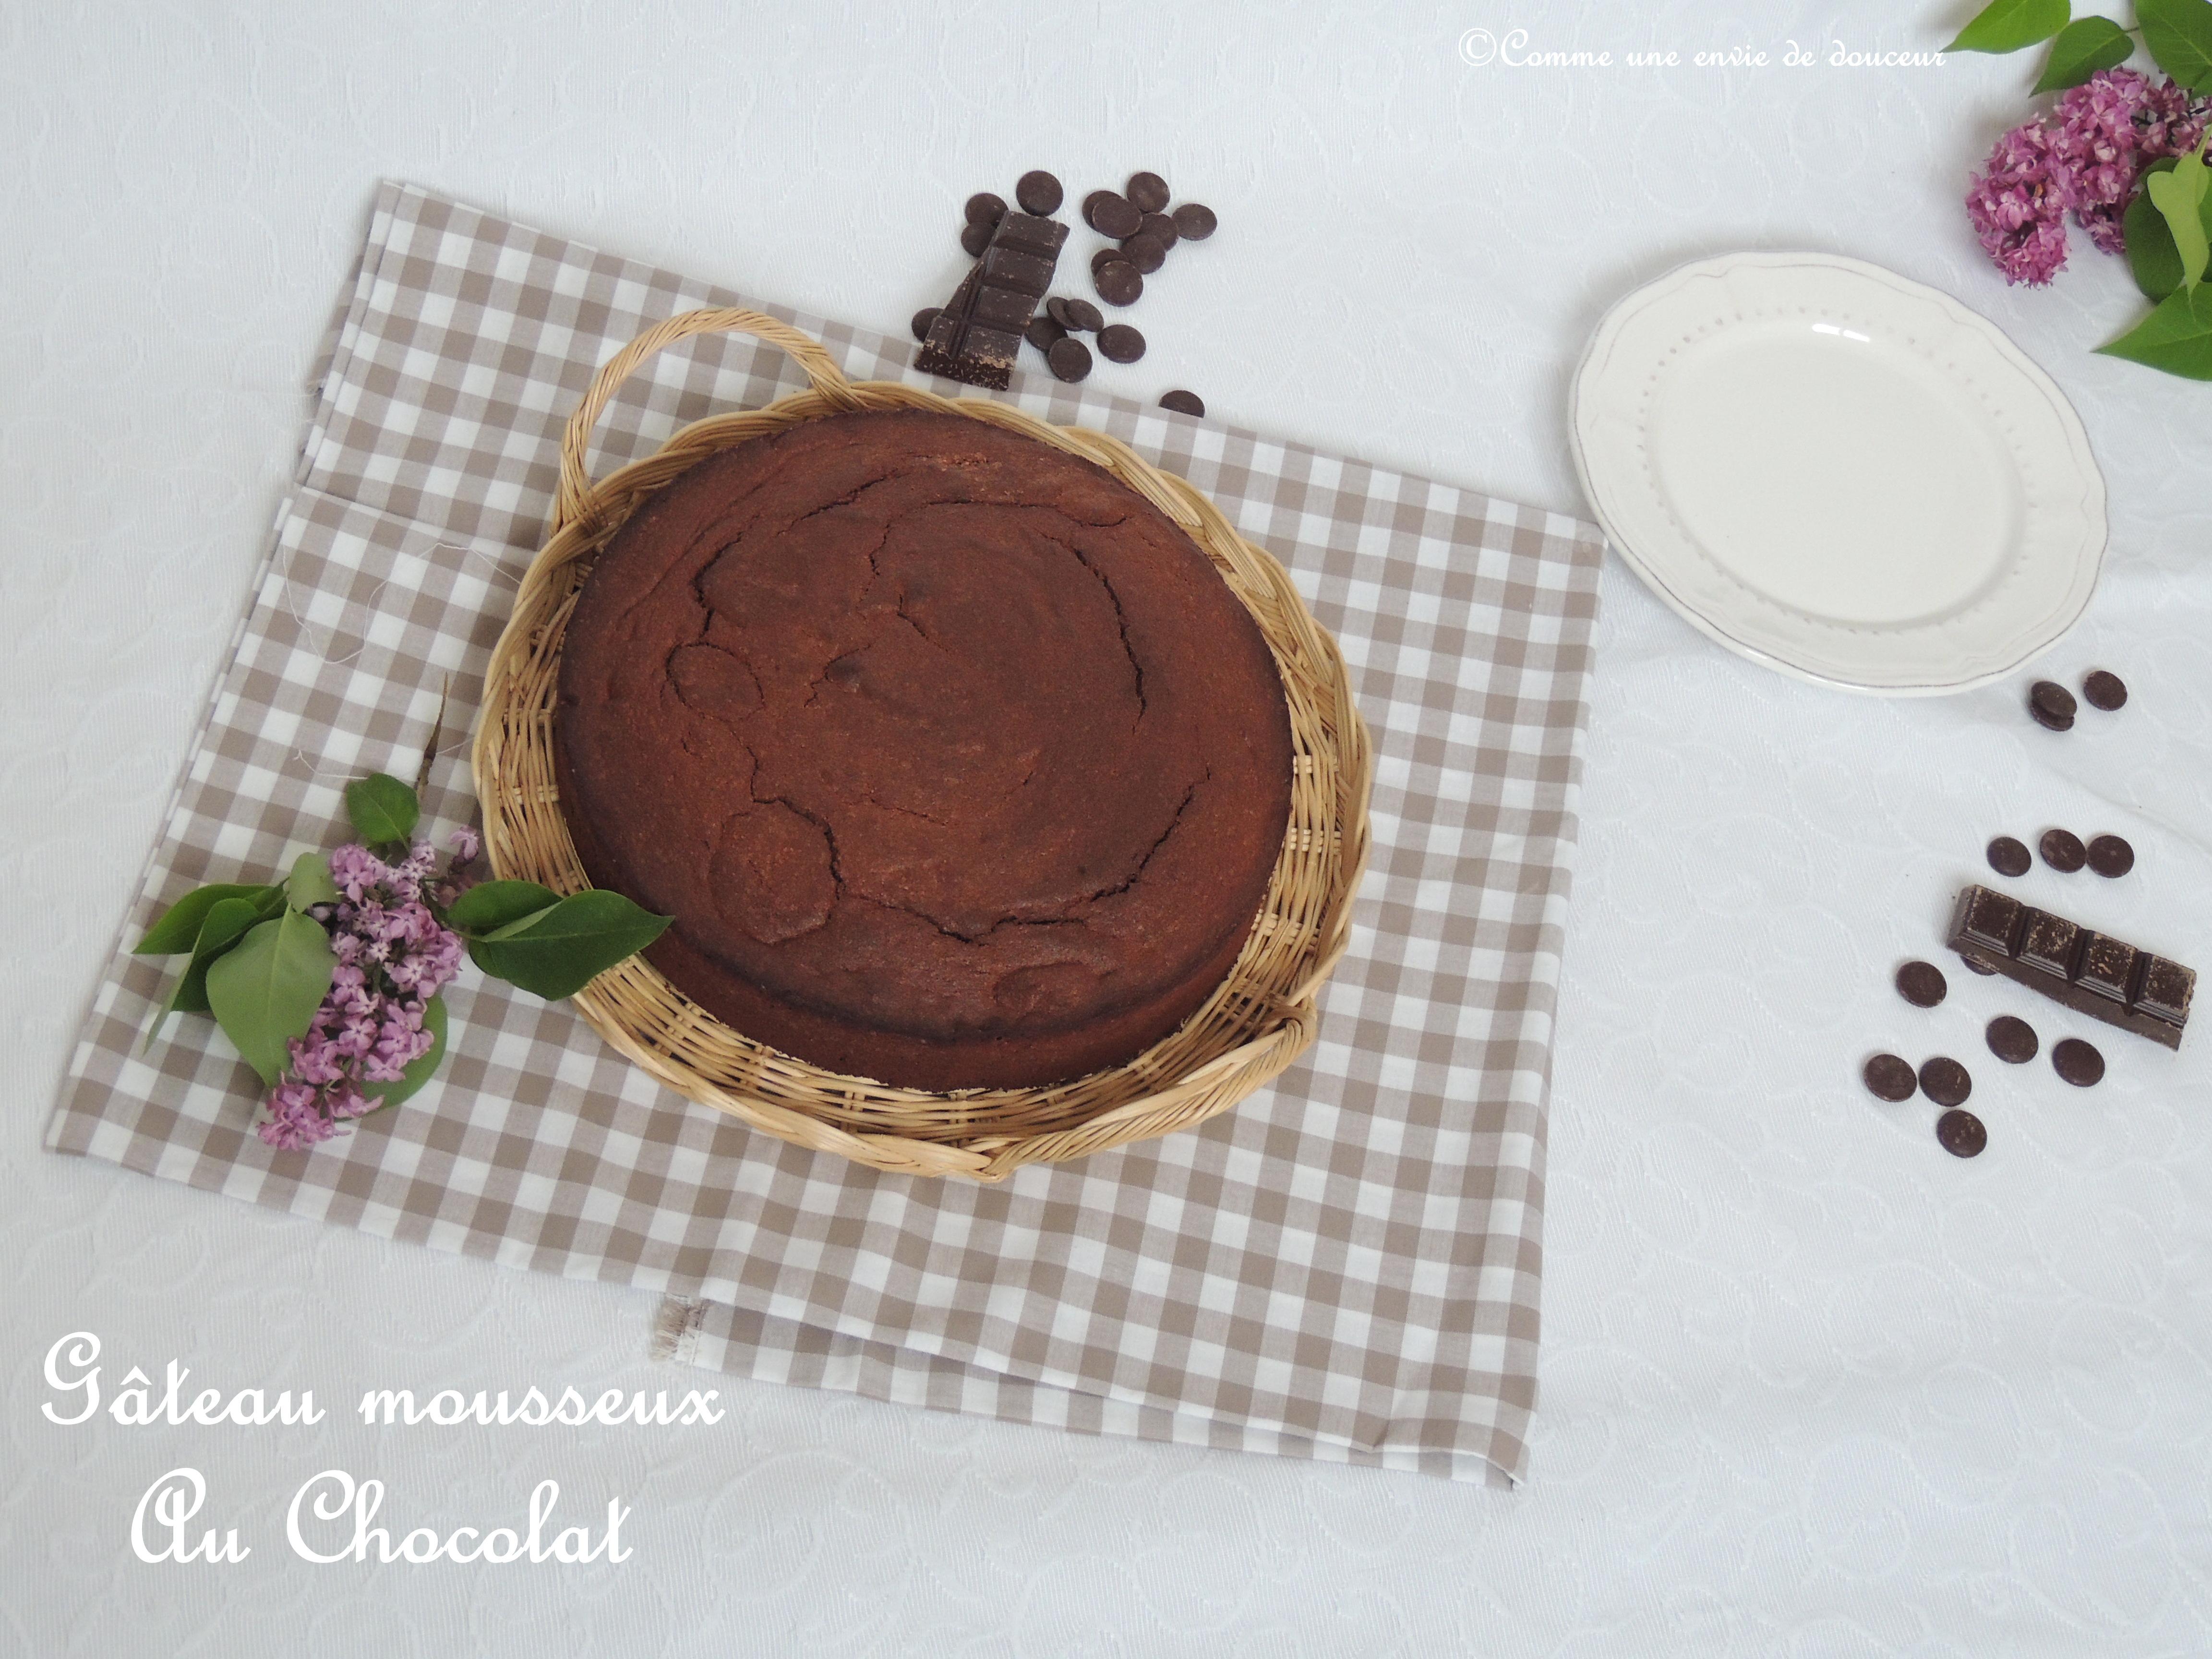 Gâteau mousseux au chocolat – Airy chocolate cake